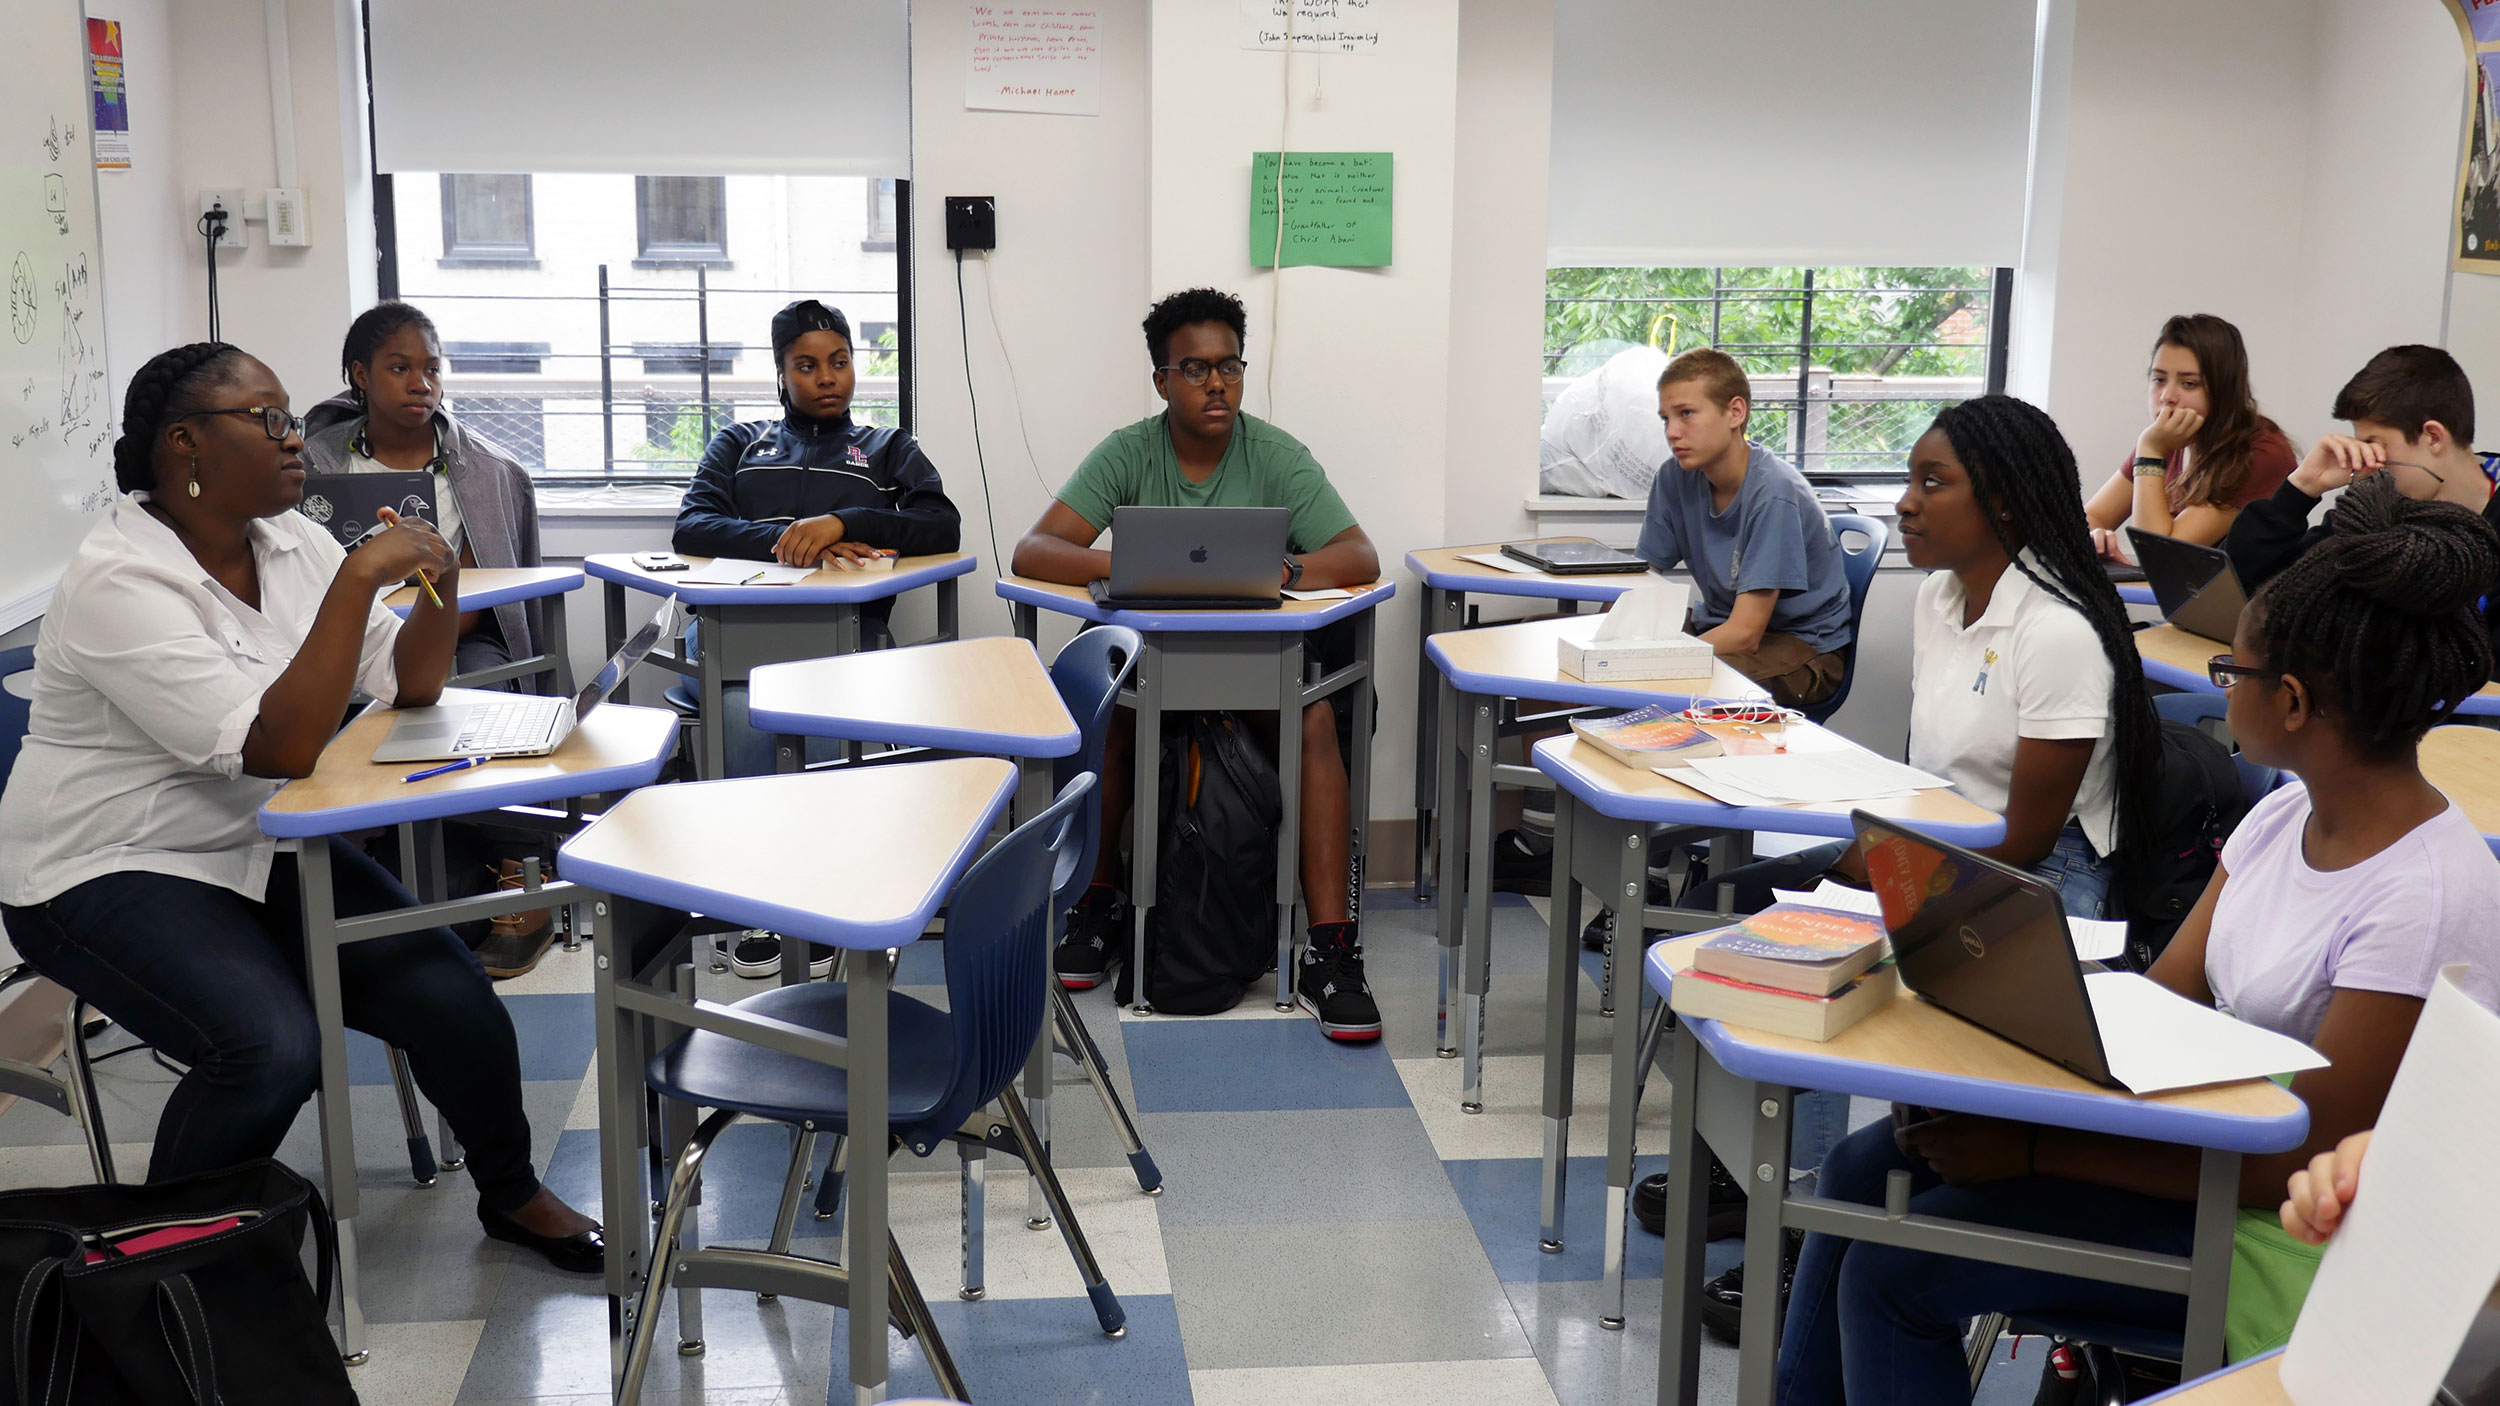 English The Berkeley Carroll School